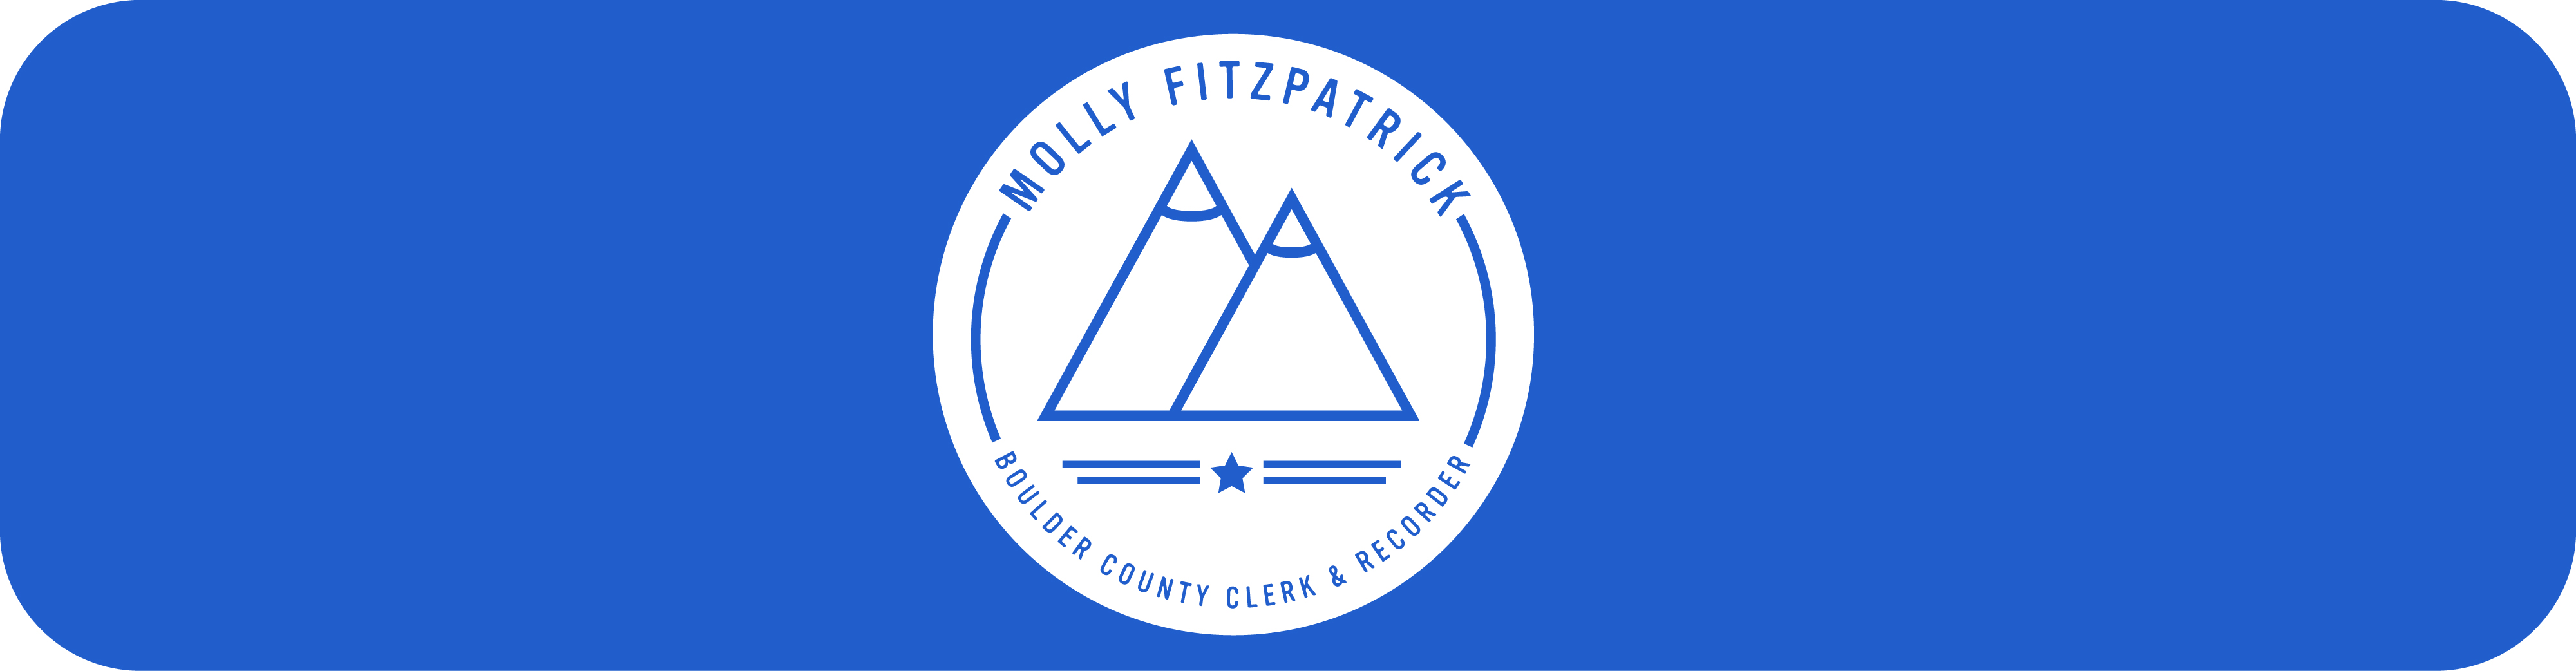 Molly Fitzpatrick